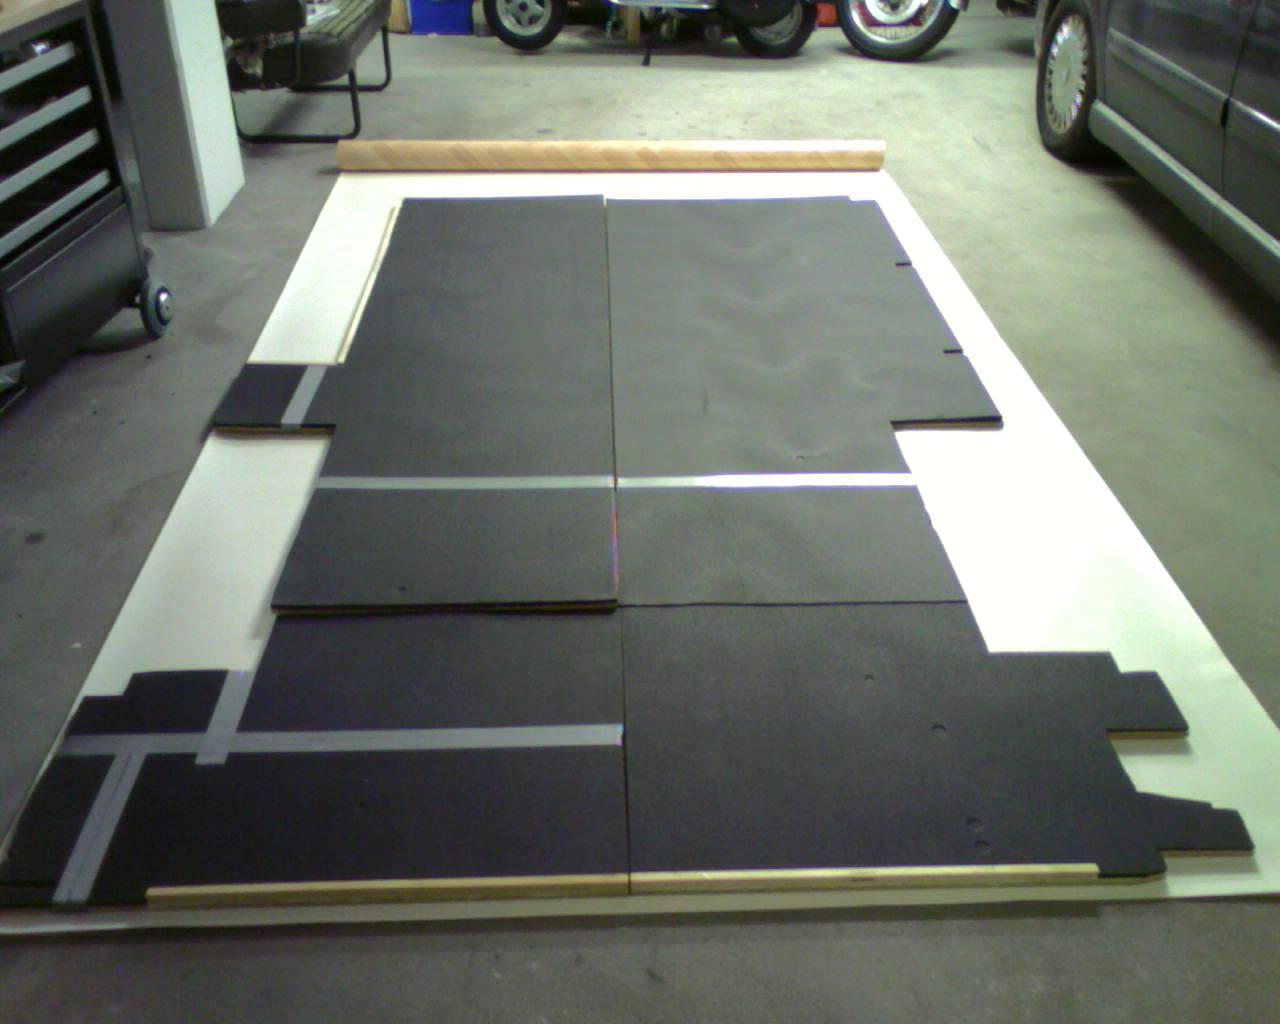 pvc boden zurechtschneiden 0212 projekt chevy van g30. Black Bedroom Furniture Sets. Home Design Ideas